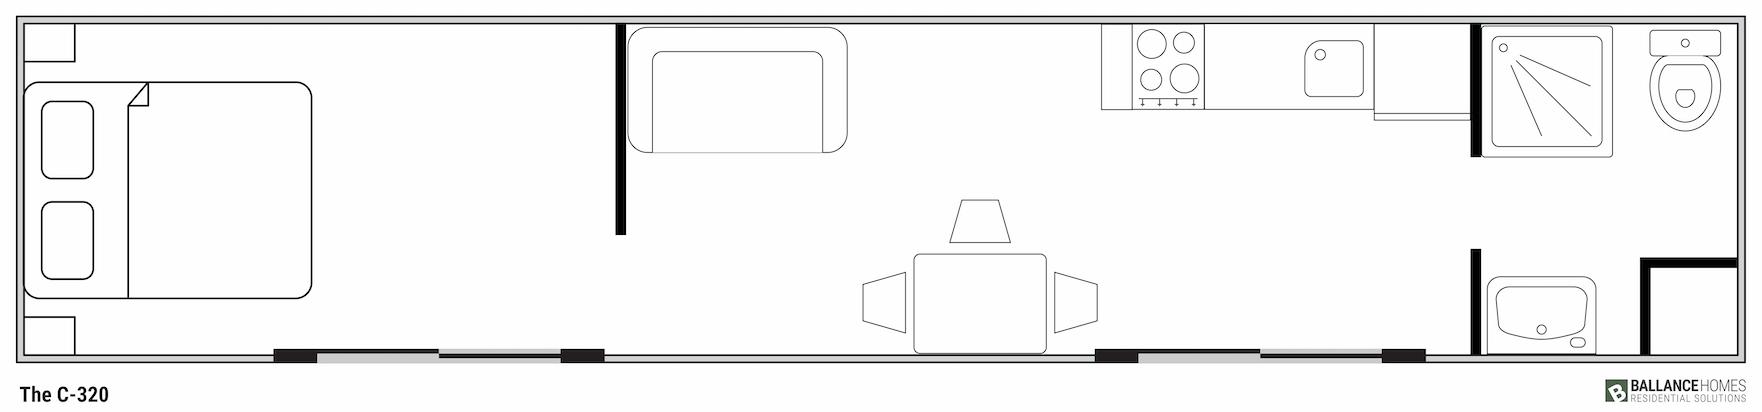 C320_Floorplan